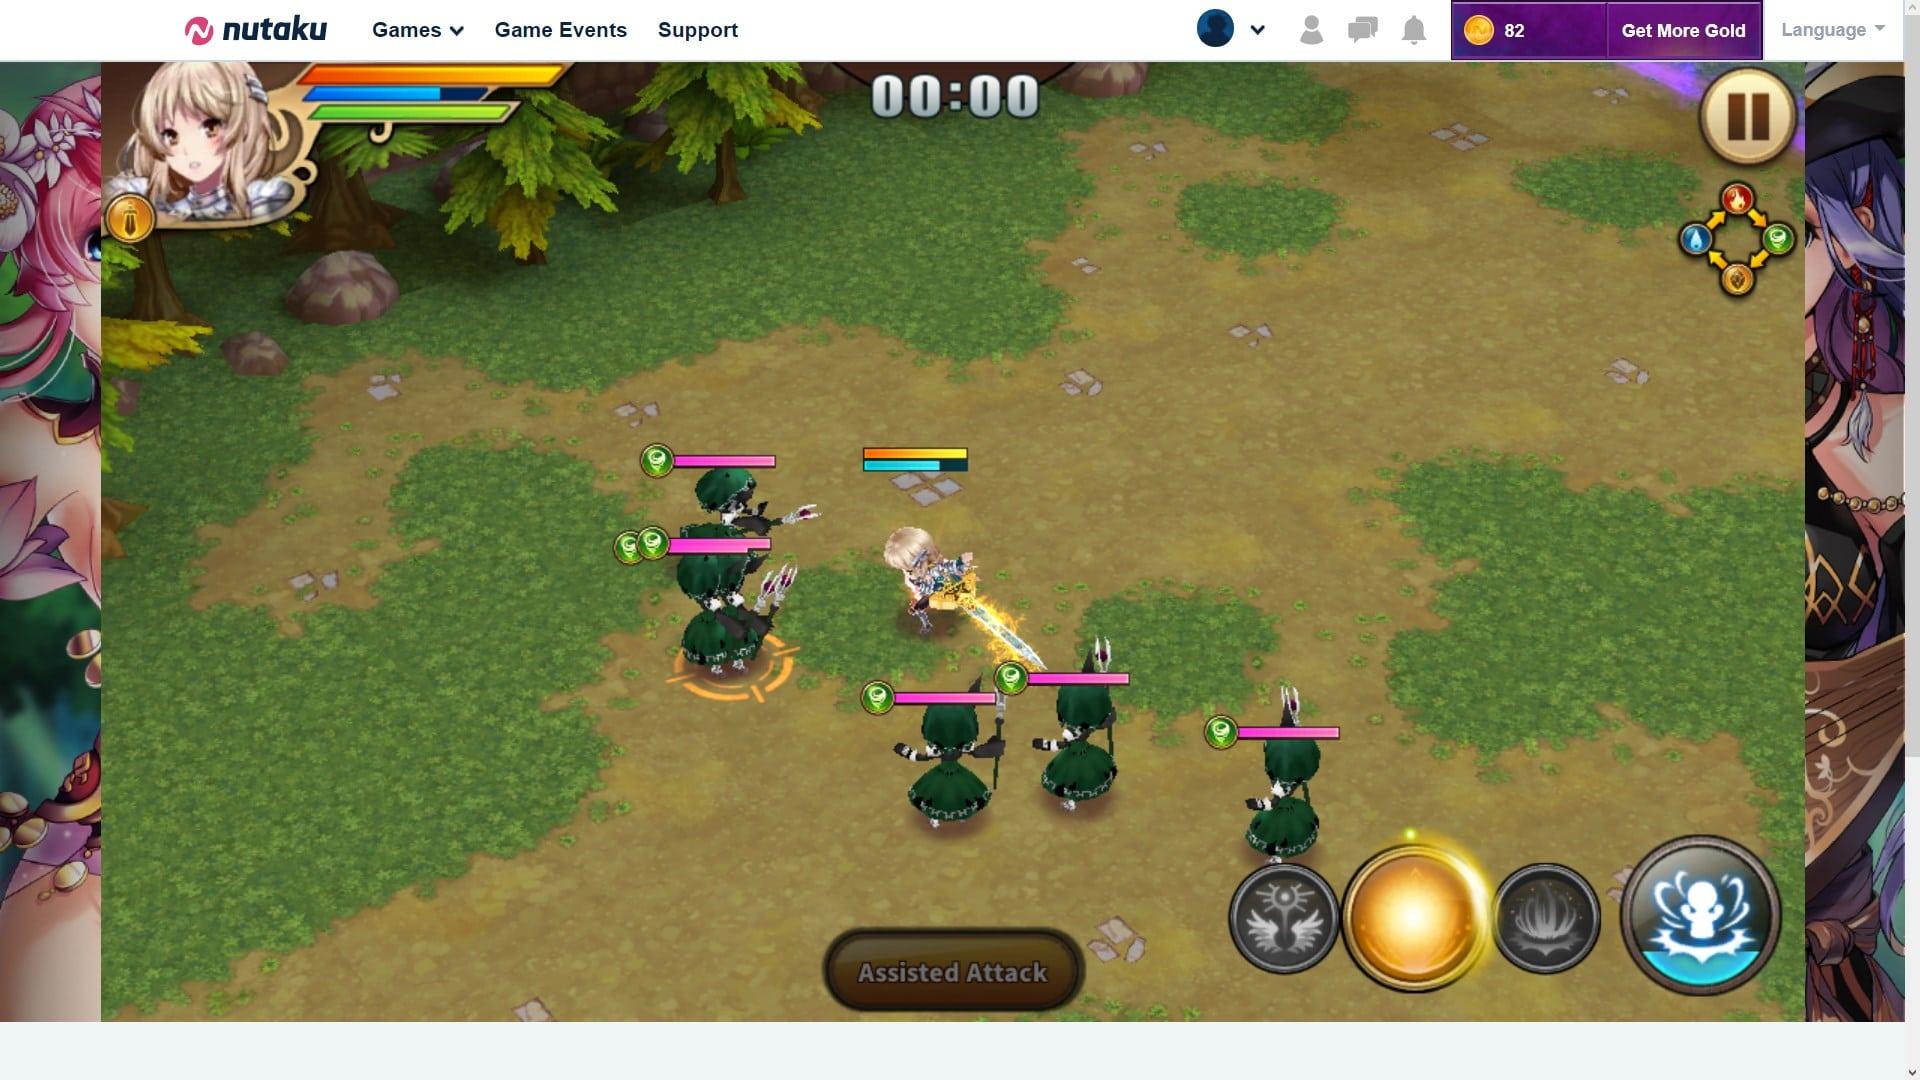 Sacred Sword Princesses Combat System